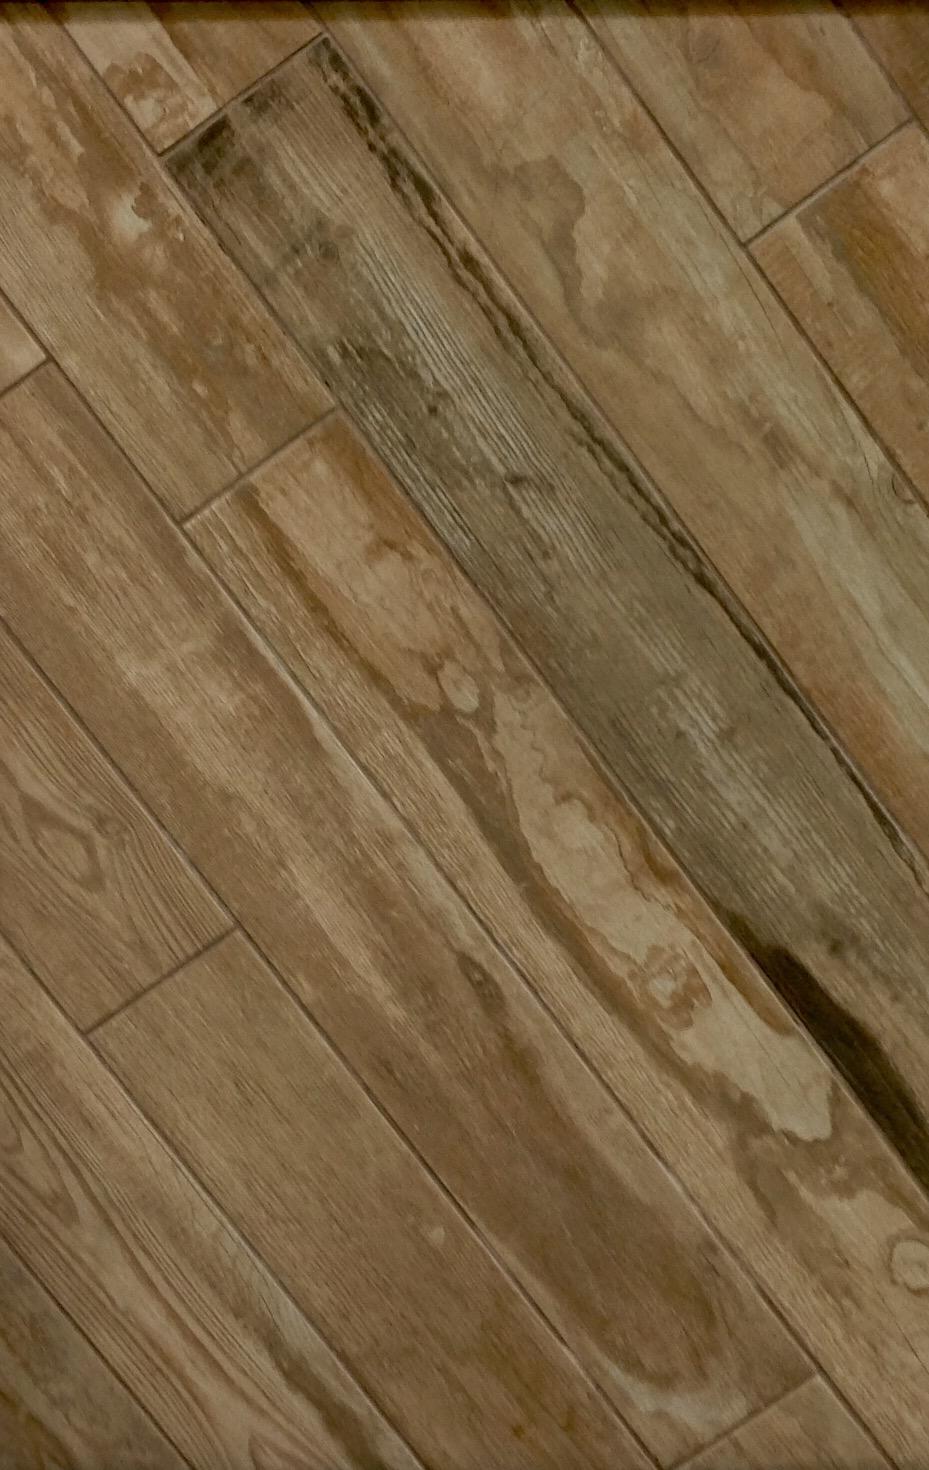 Plank tile flooring more plank tile flooring 1 1 dailygadgetfo Choice Image